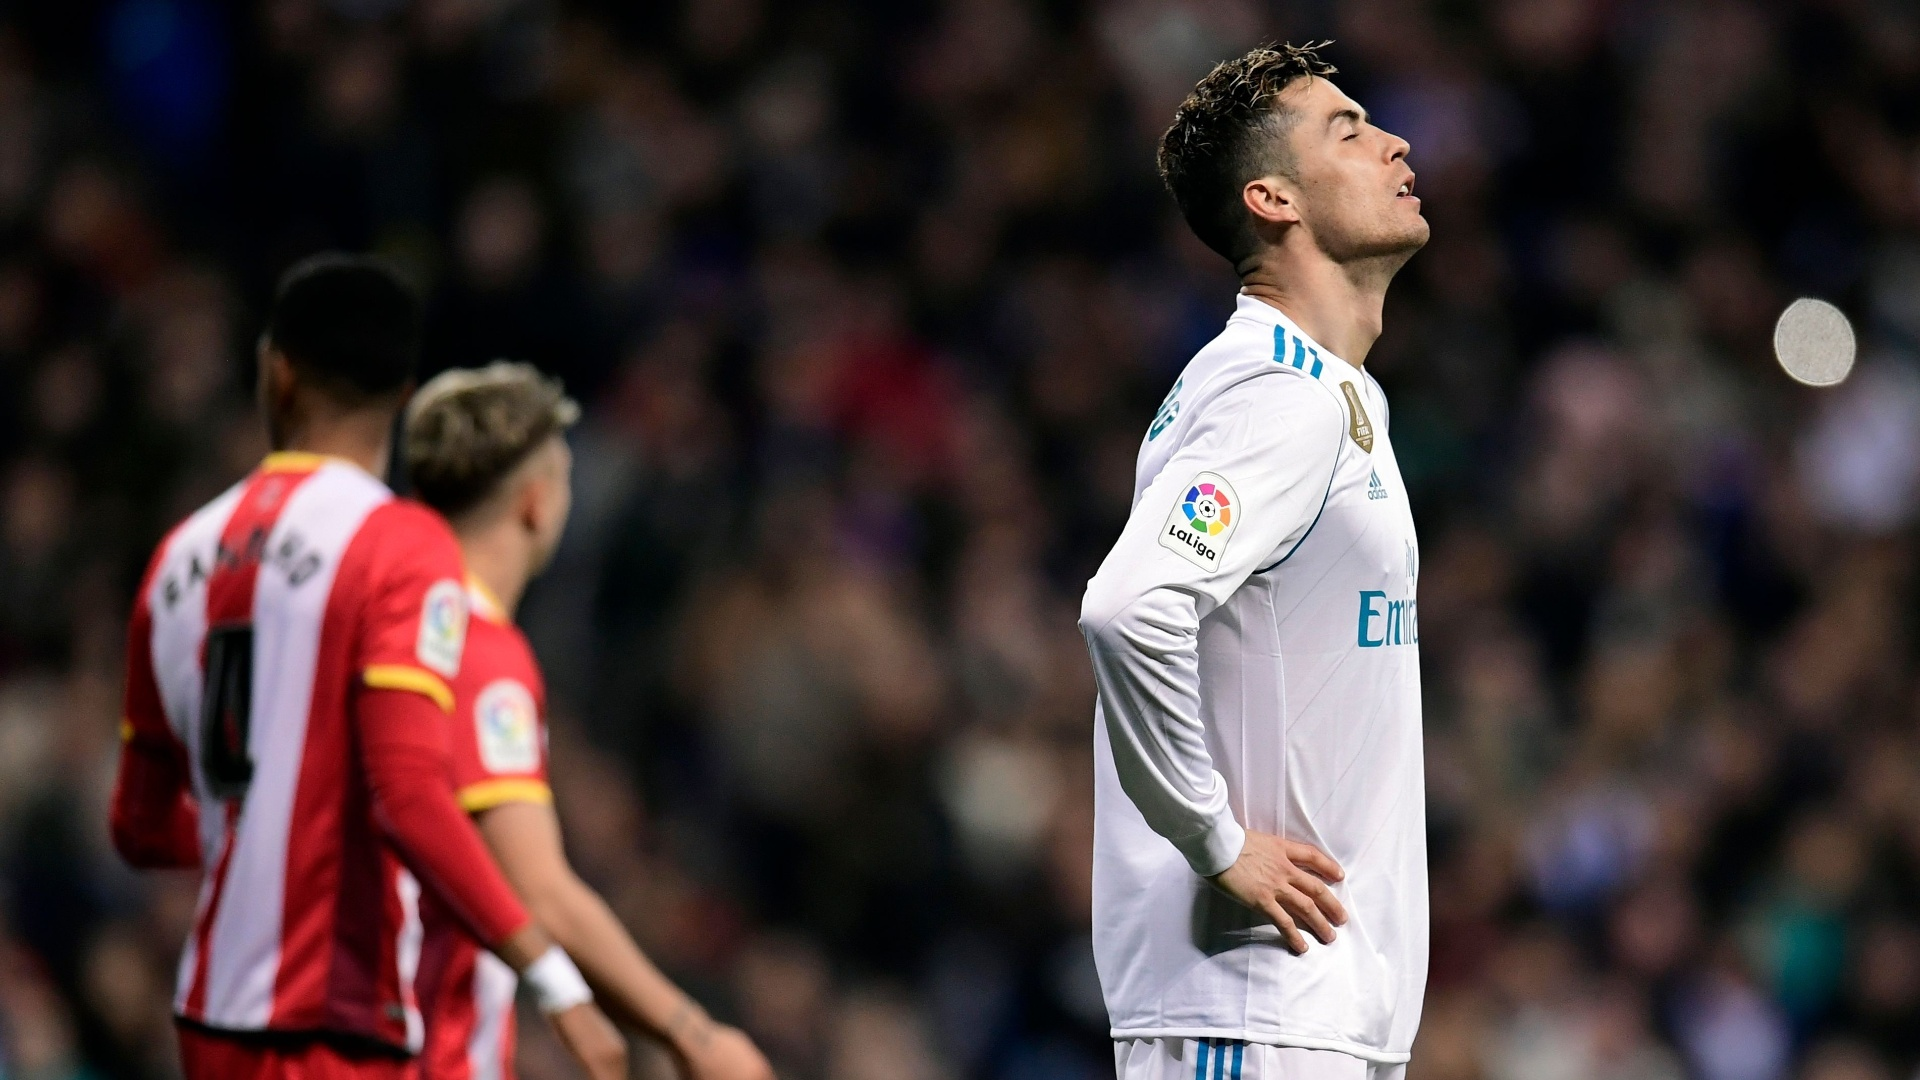 Cristiano Ronaldo lamenta chance perdida pelo Real contra o Girona